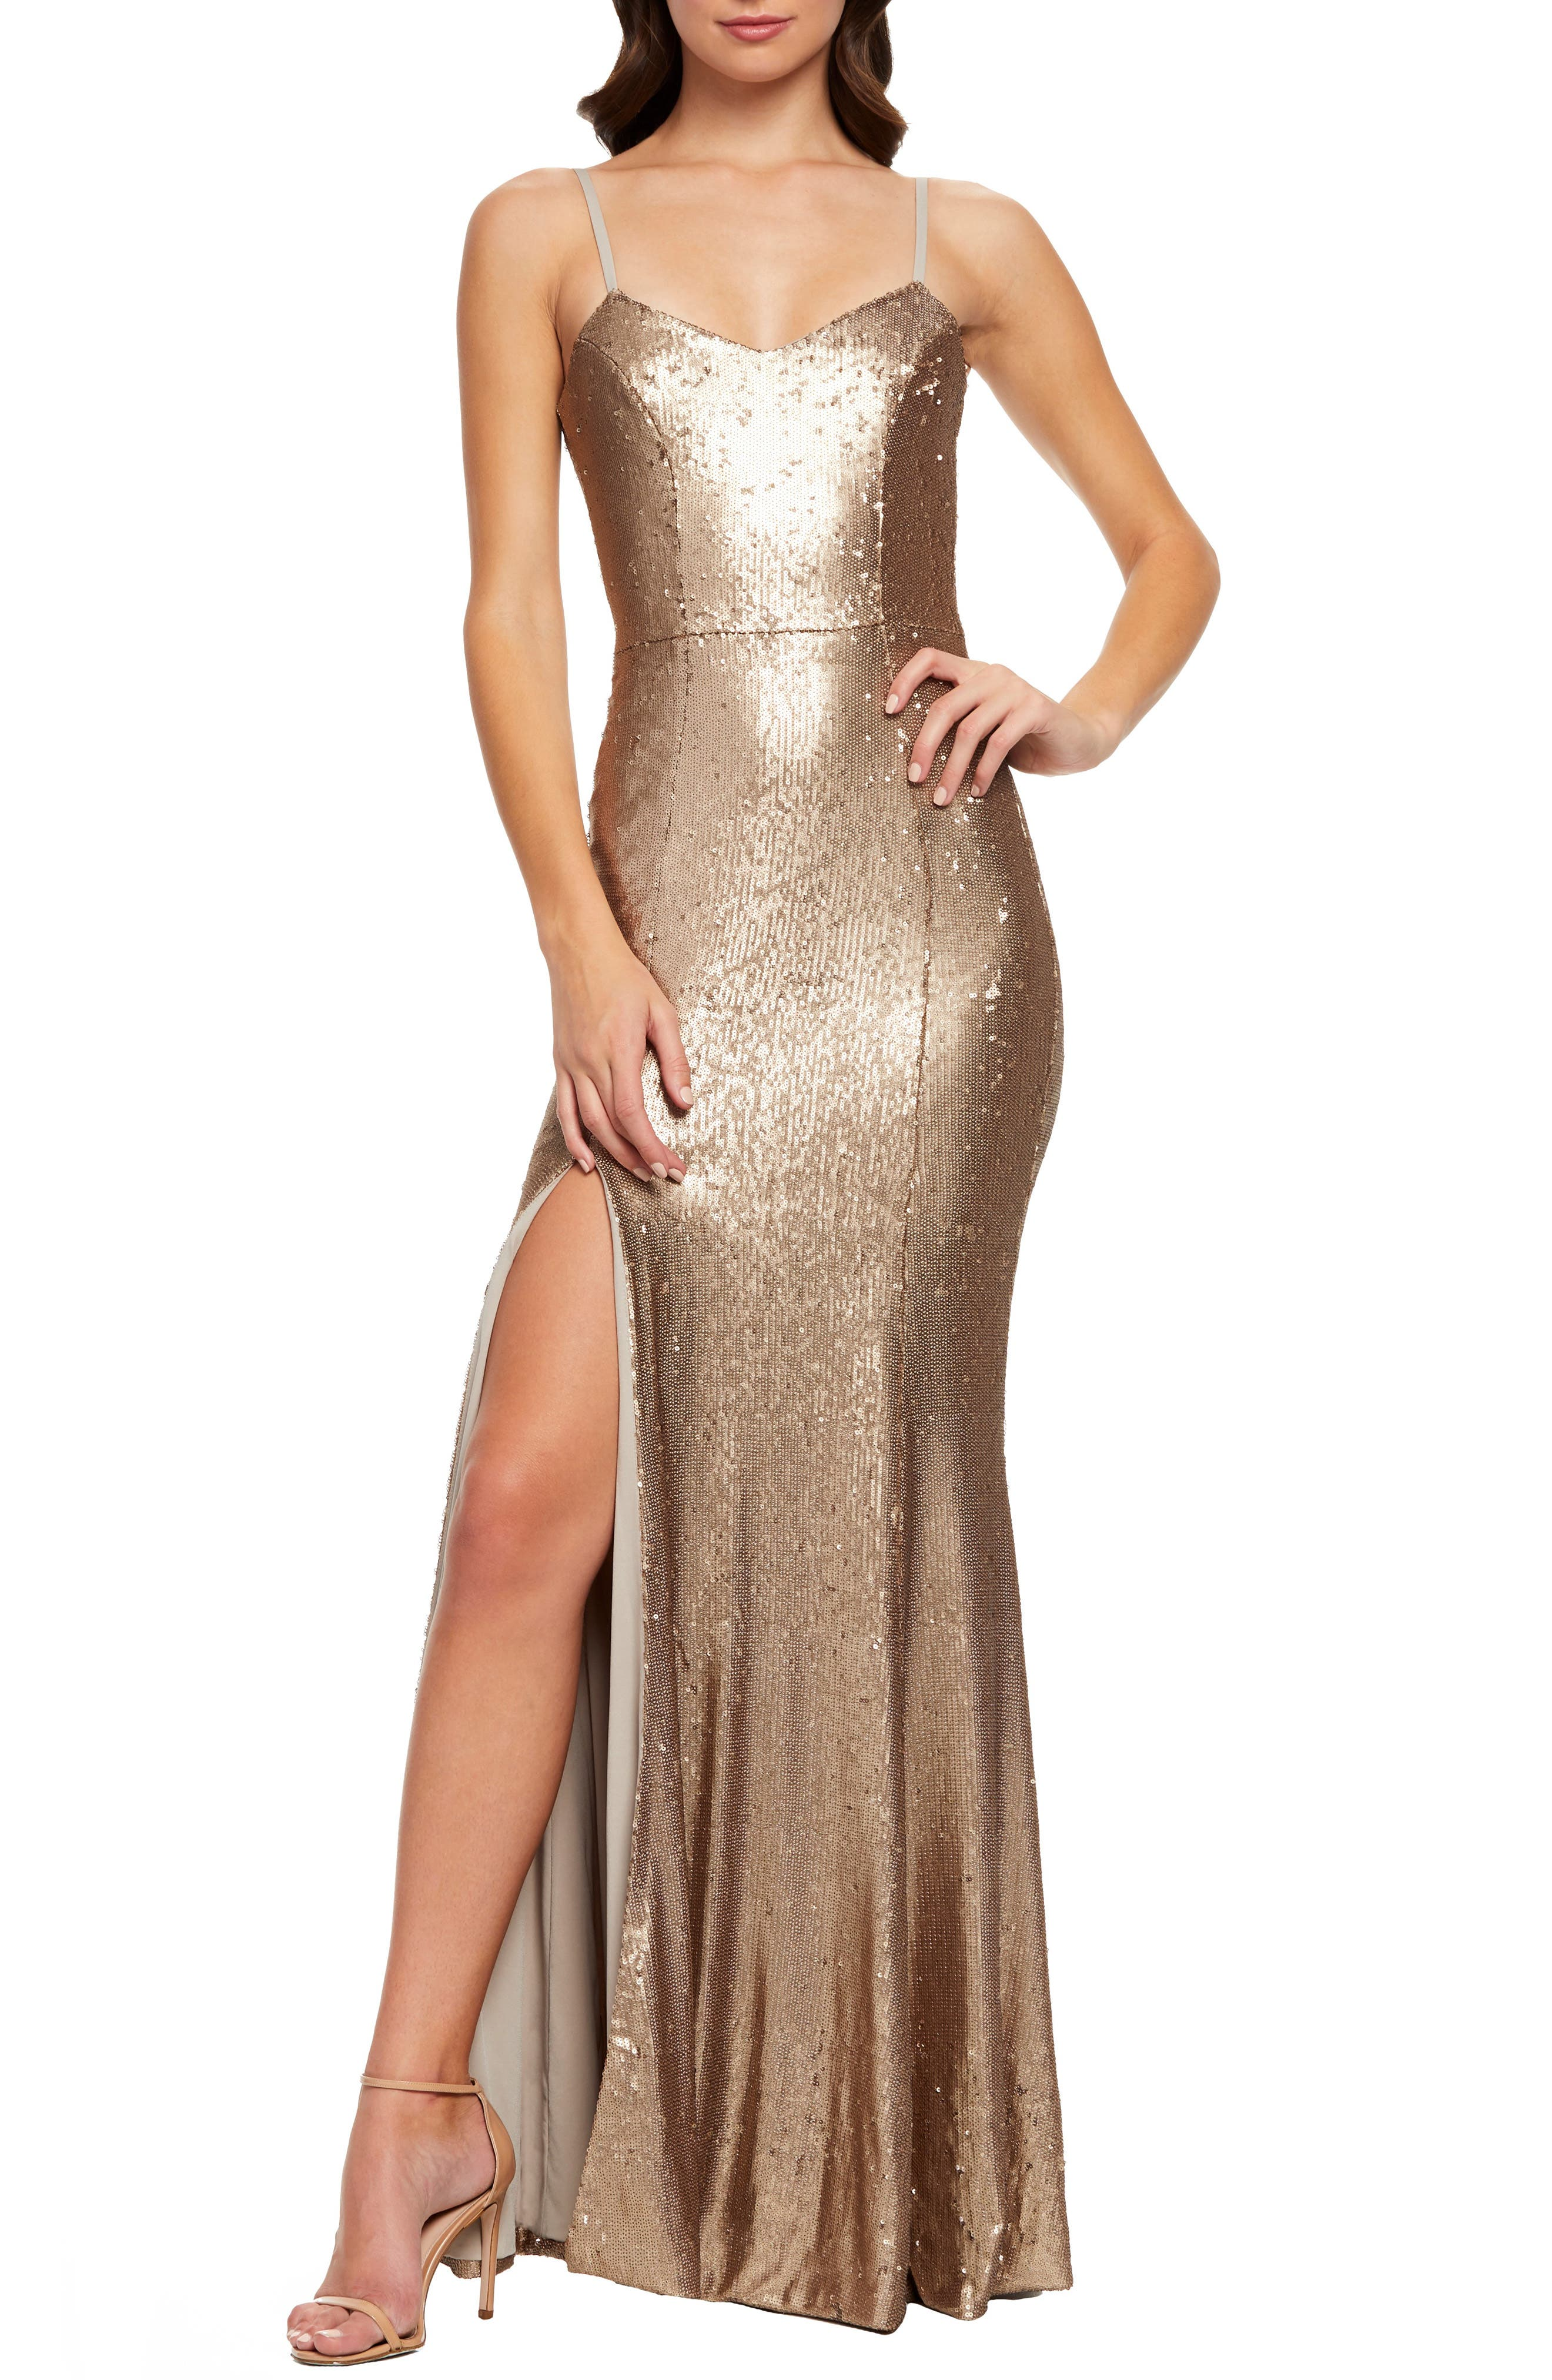 1960s – 70s Cocktail, Party, Prom, Evening Dresses Womens Dress The Population Ingrid Sequin Evening Dress $319.00 AT vintagedancer.com